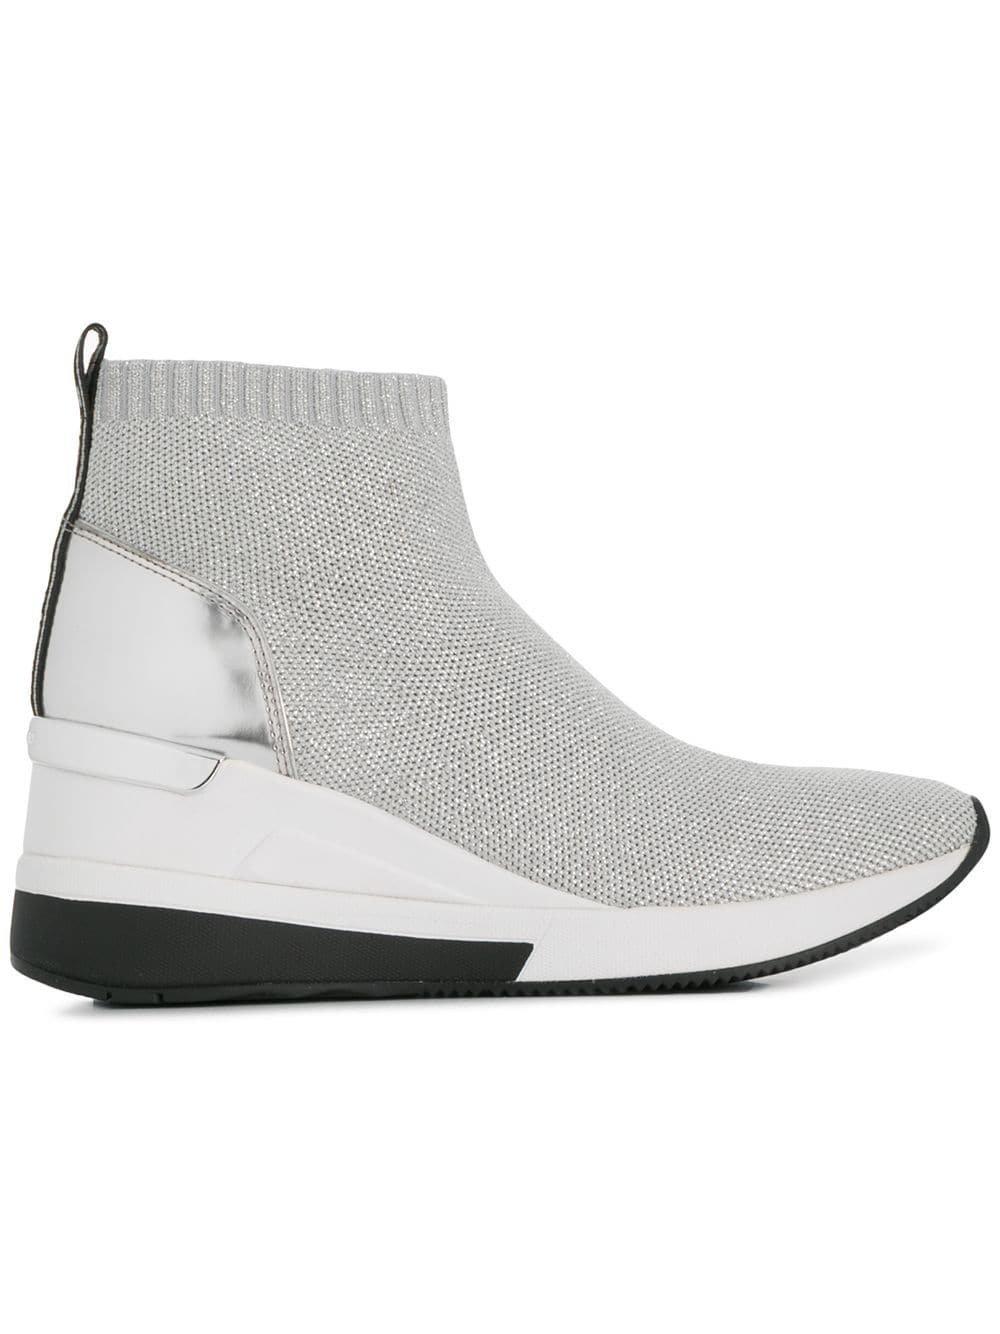 a9b6f16e2c8 Michael Michael Kors Skyler sneakers (zilver) | 43R9SKFE5D | Michael ...